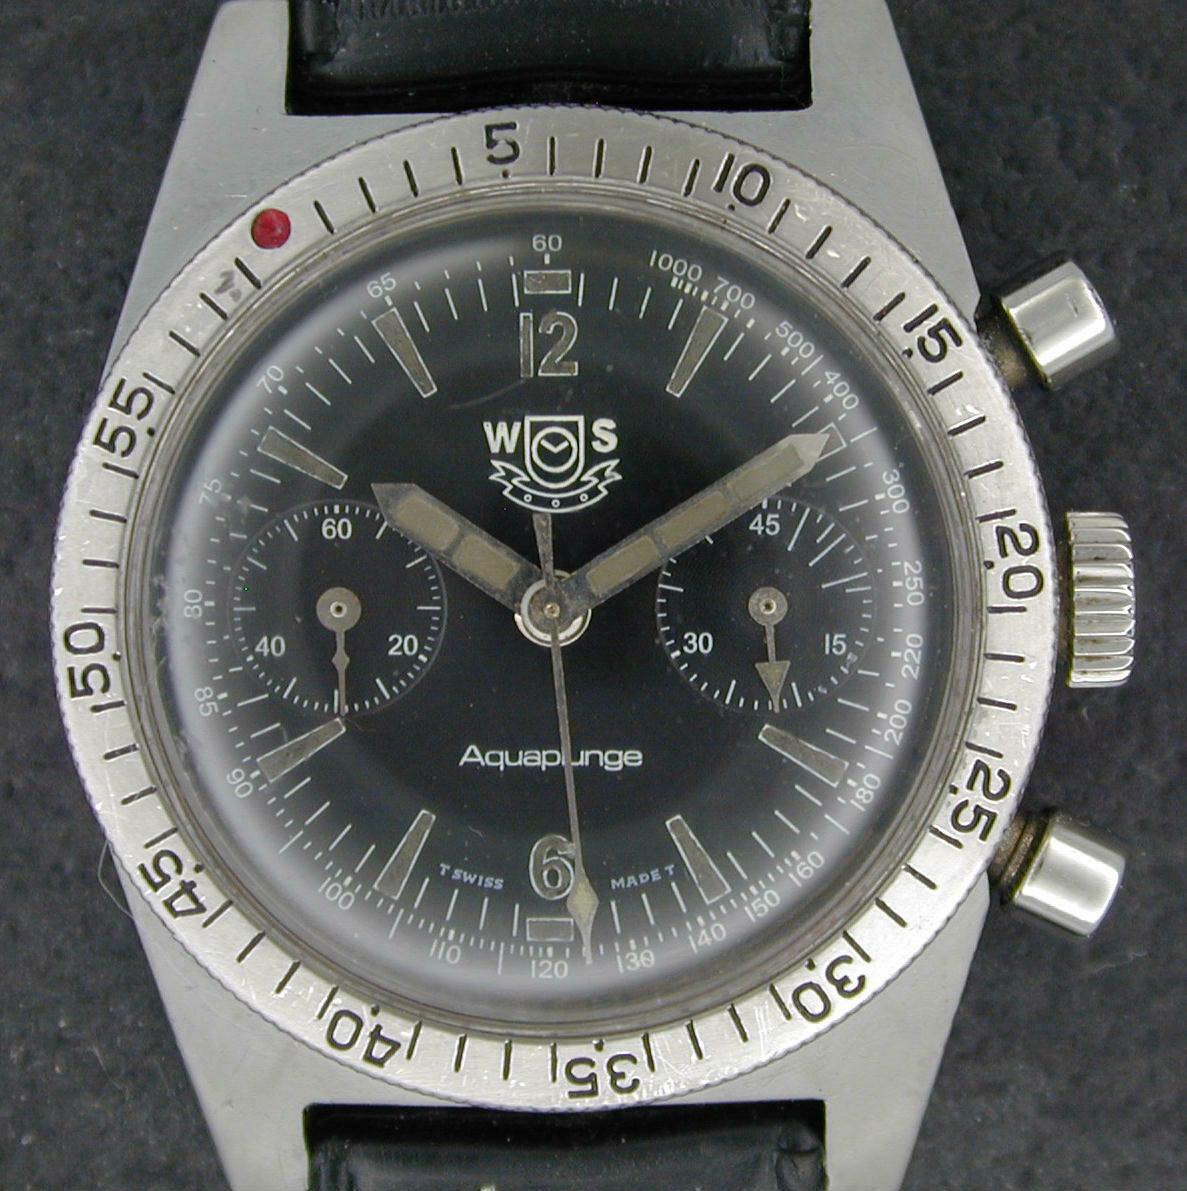 WS Aquaplunge Chronograph #200115